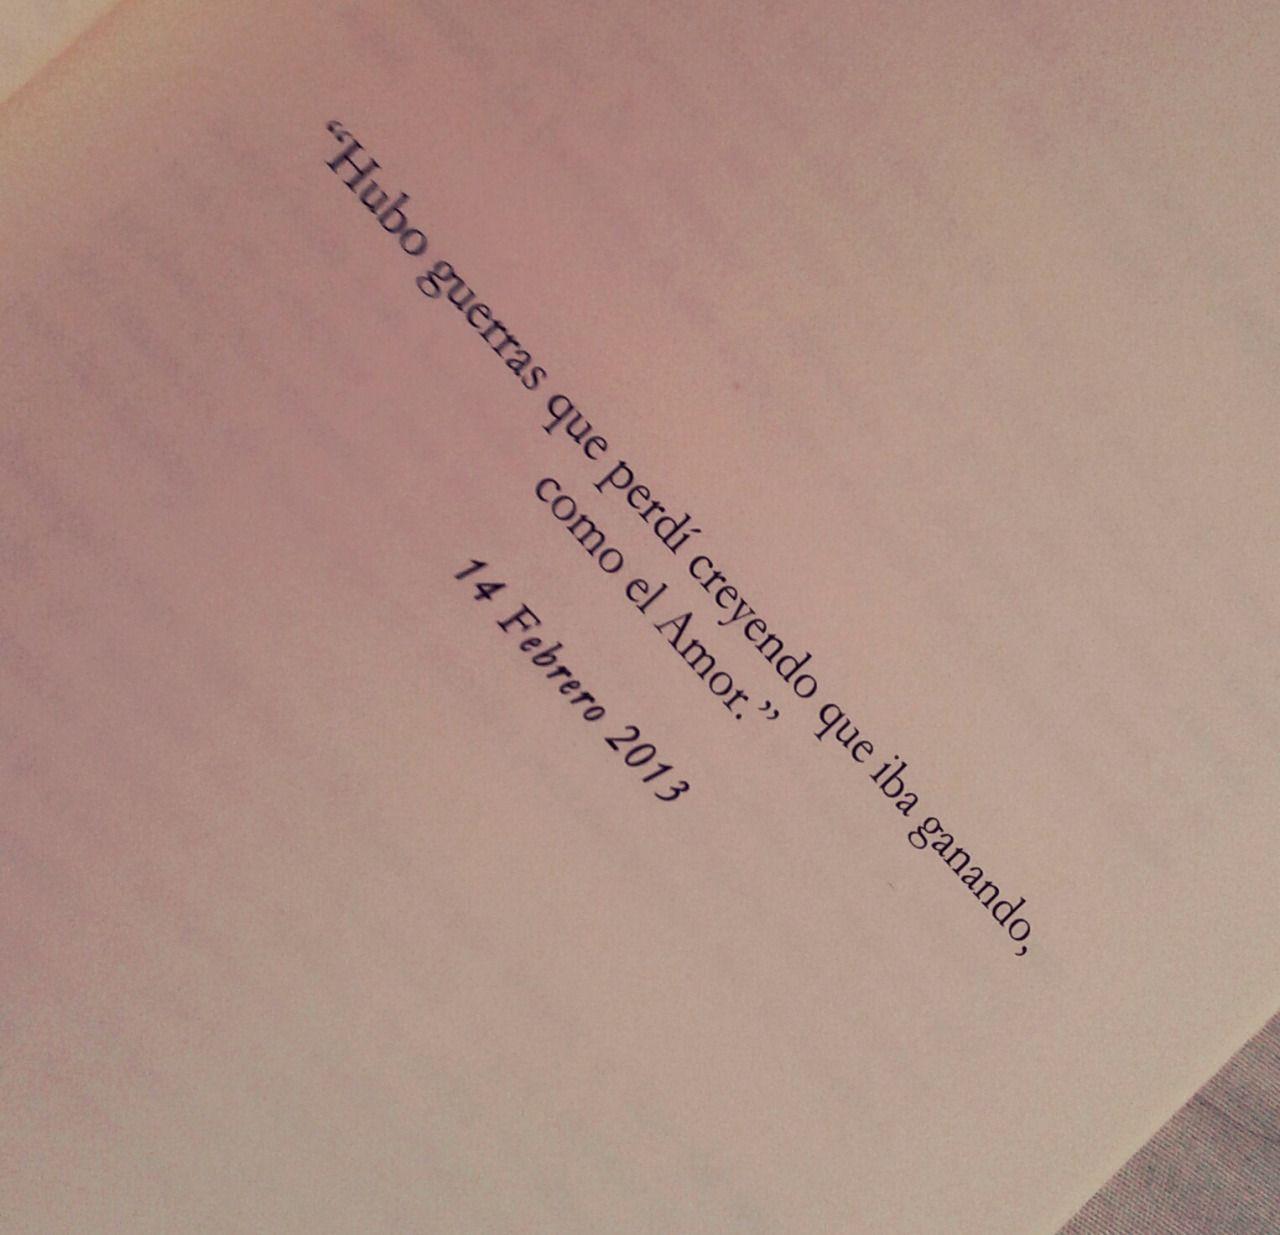 Pin De Liessel Reik En Frases Pinterest Libros Frases Tumblr